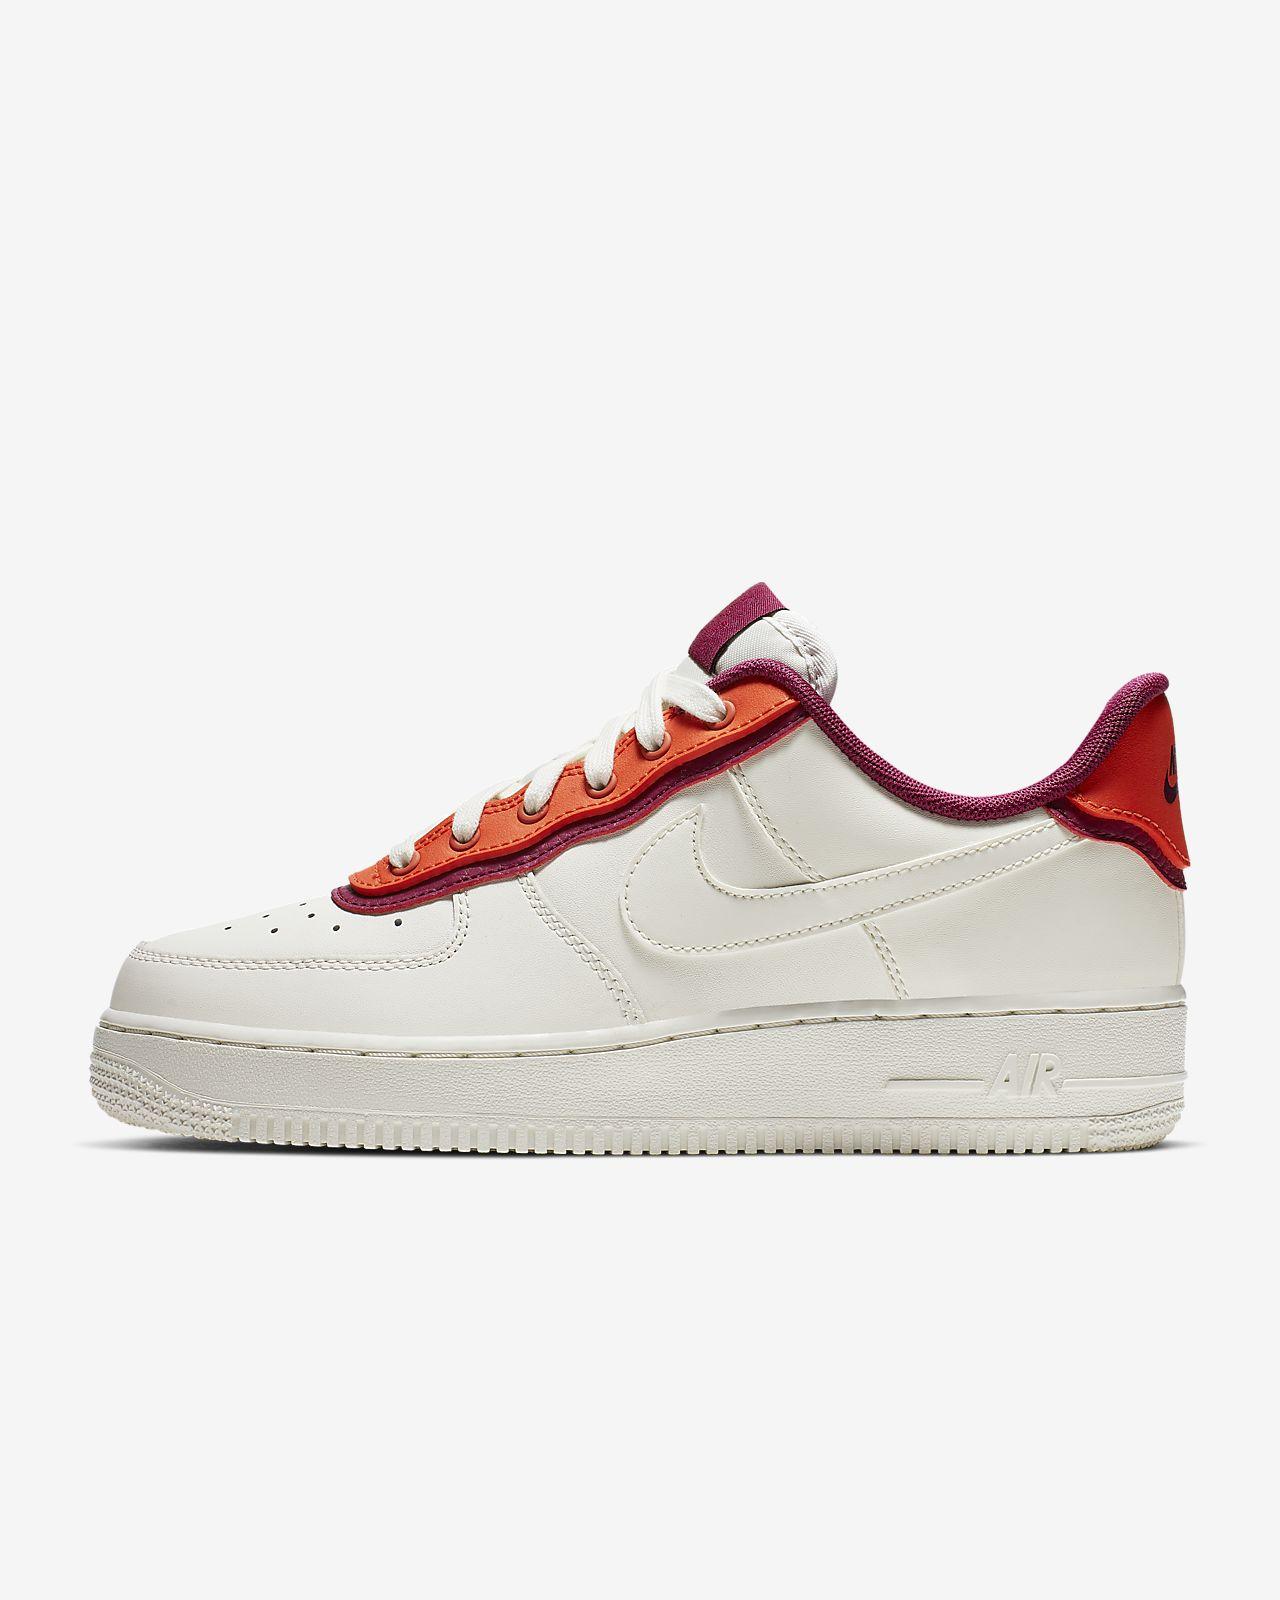 best service 4ac0a 8d4aa ... Chaussure Nike Air Force 1  07 SE pour Femme